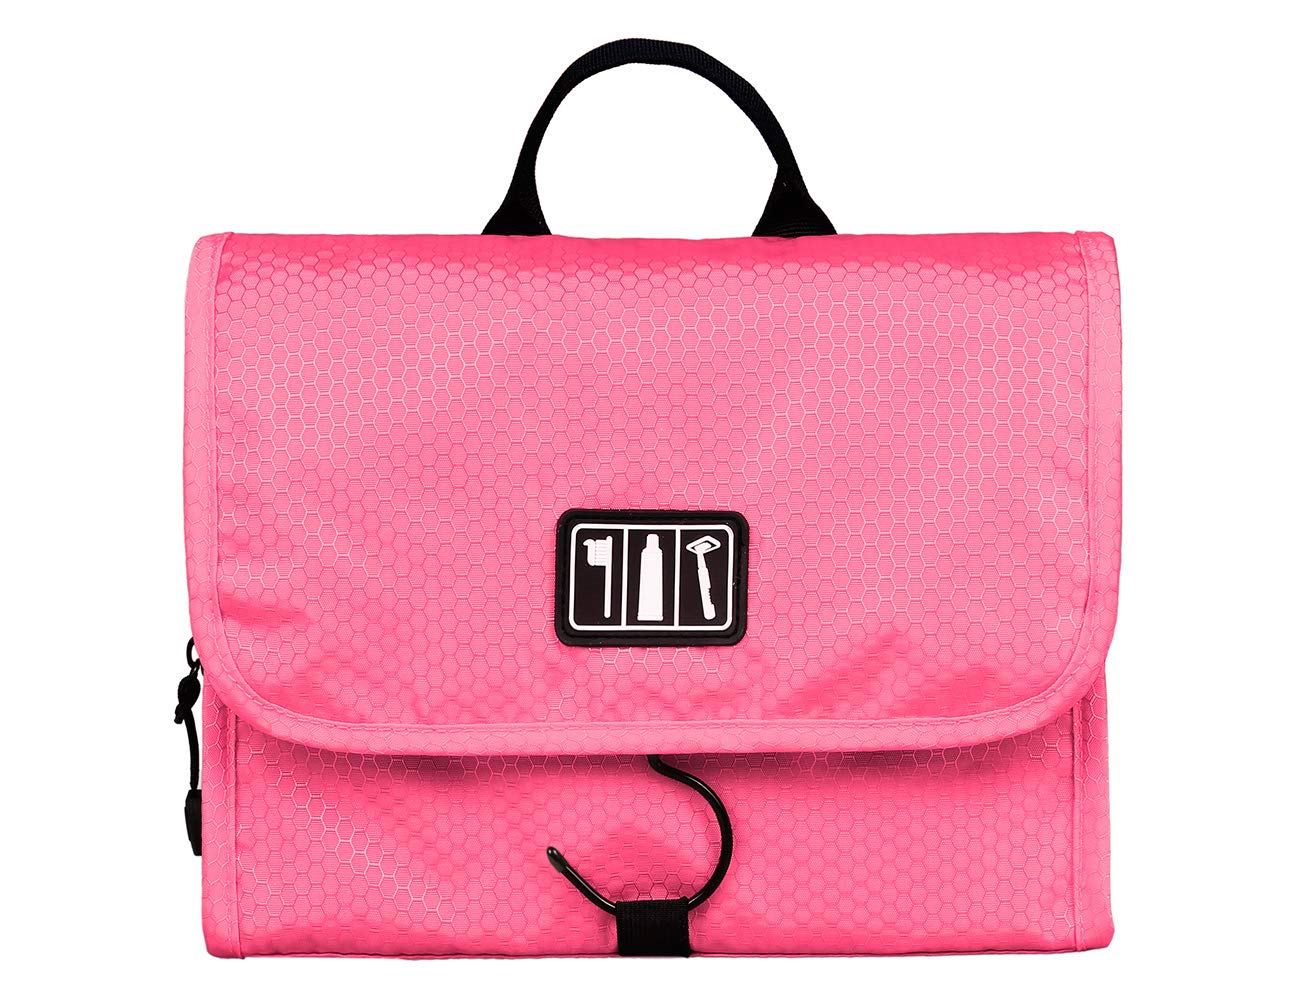 BAGSMART Small Travel Toiletry Bags Hanging Bathroom Bag Portable Toiletry Kit Clear Cosmetic Makeup Bag Case Organizer-Black Bags-mart BAG020050001-FCA